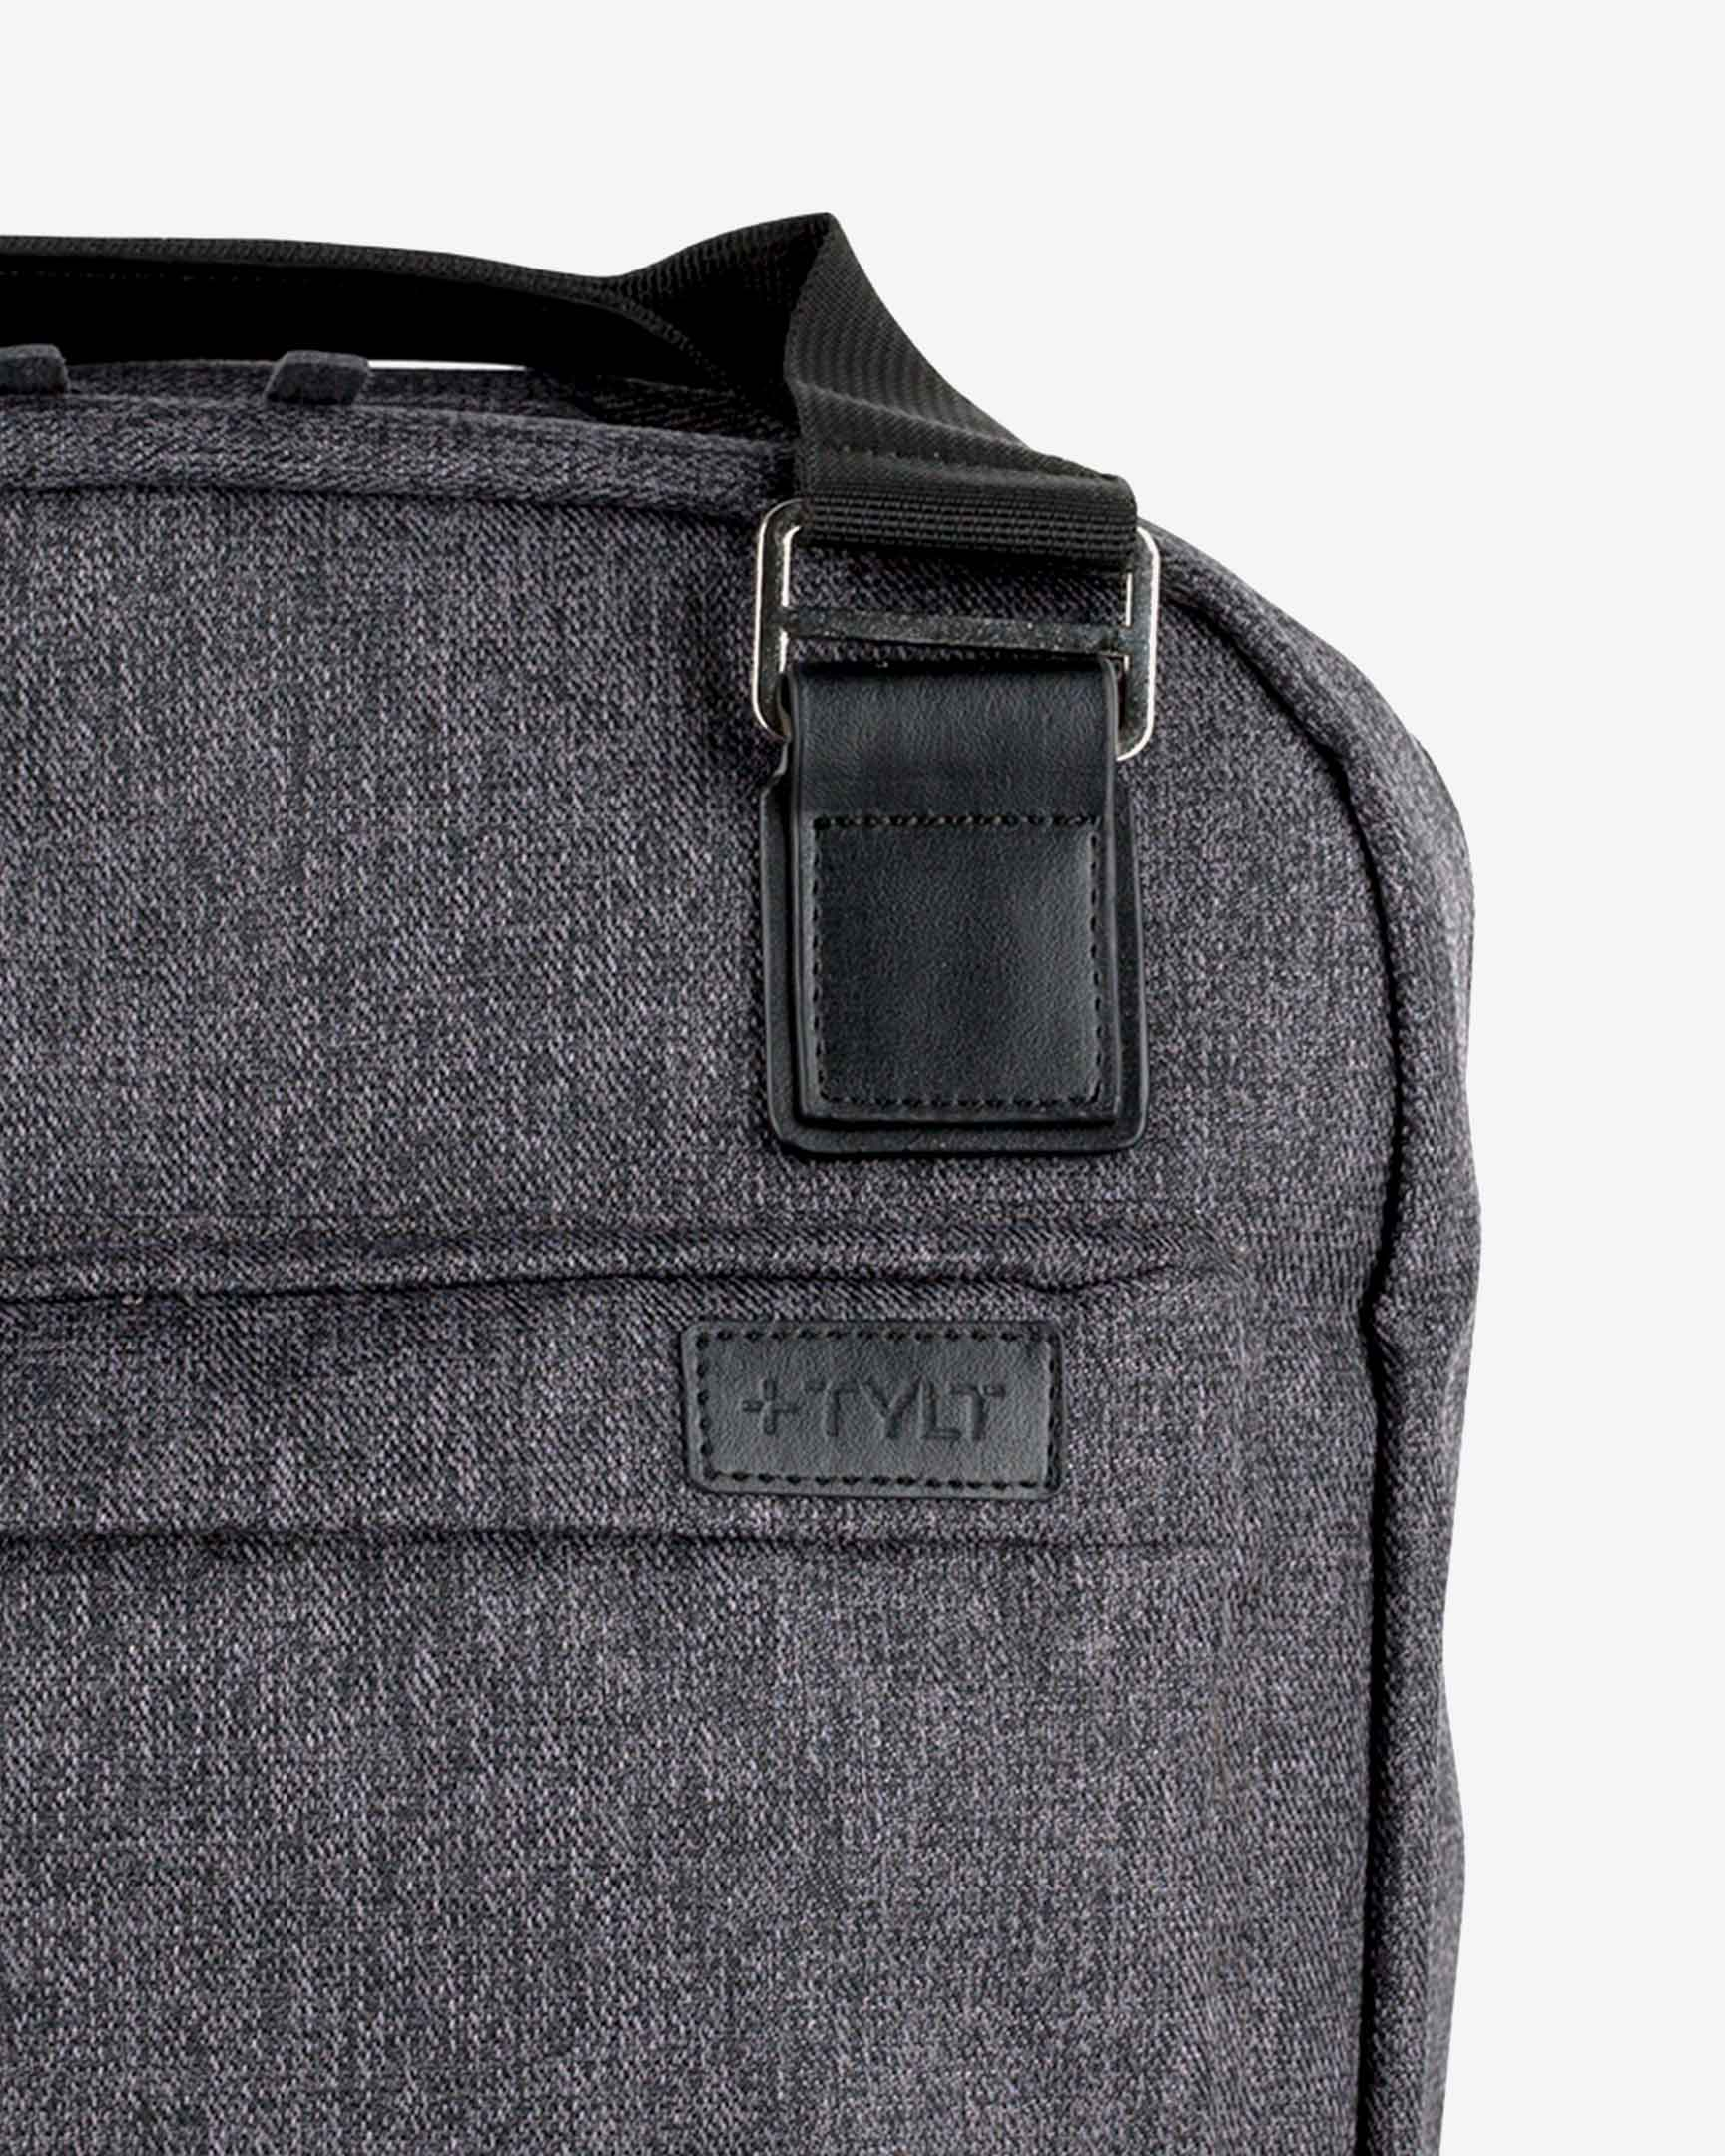 Tylt Lifestyle Power Bag detail